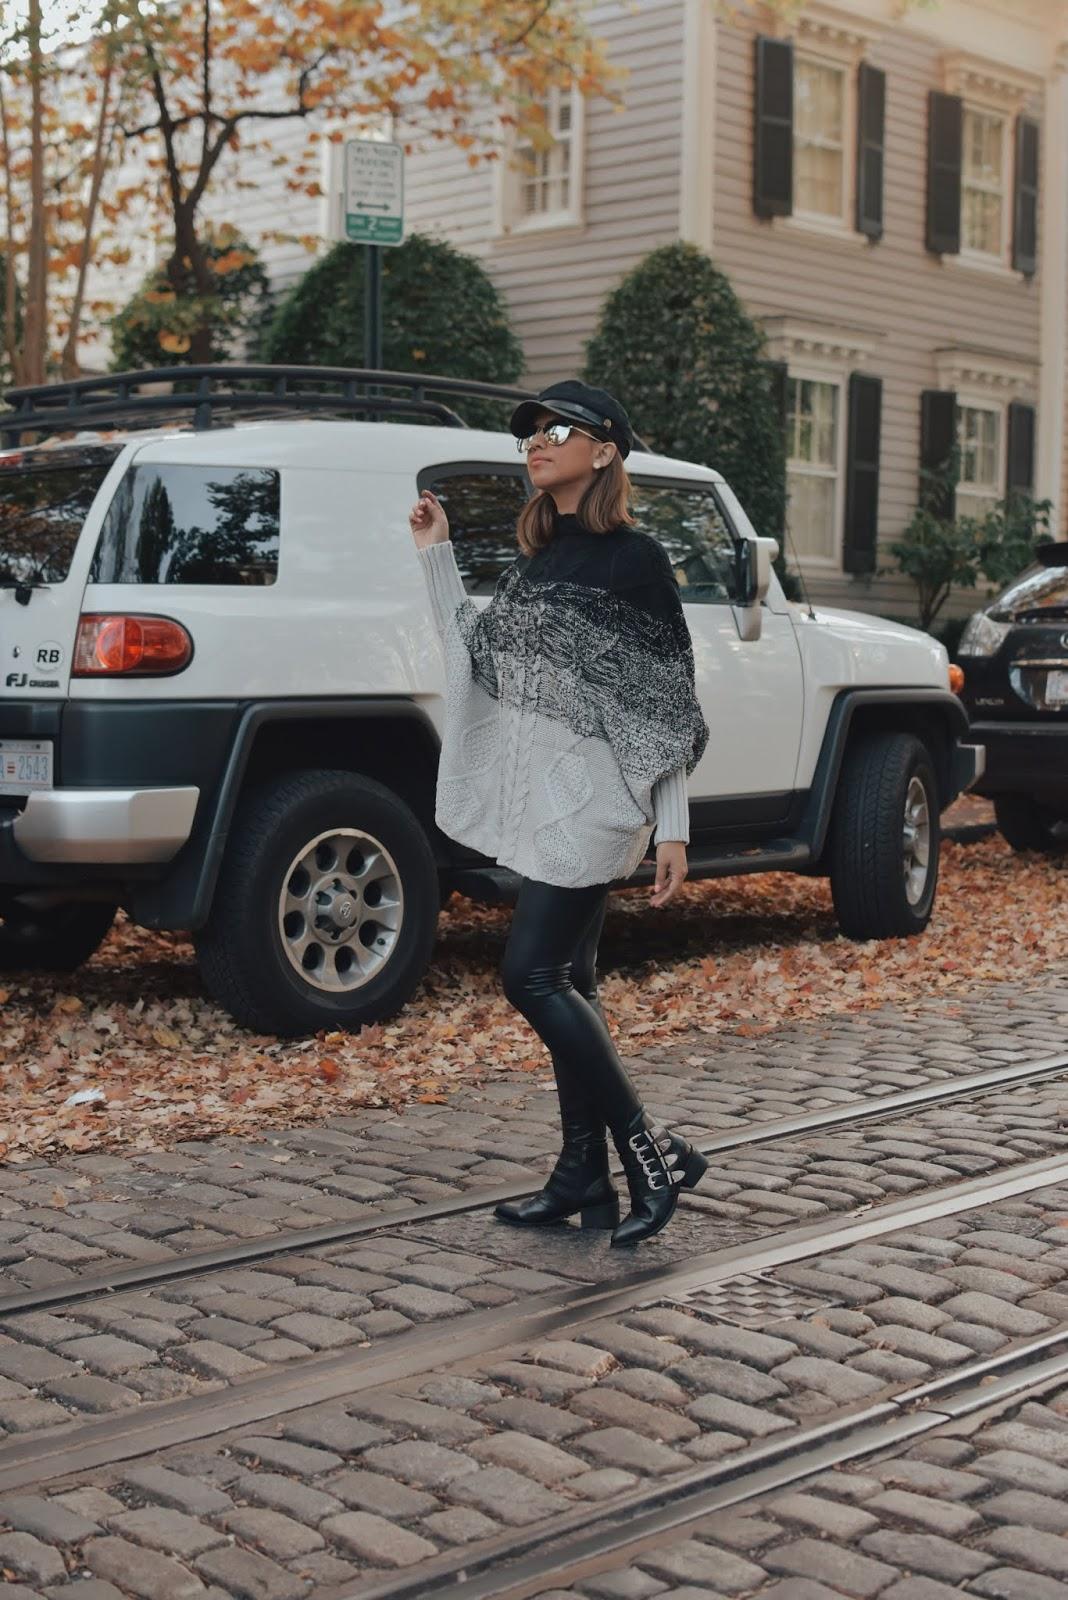 Un outfit cañero para el otoño-mariestilo-travelblogger-streetstyle-fashionblogger-modaelsalvador-modamexico-youtuber-canal de mariestilo-fashionista-armandhugon-lookbook-sheingals-